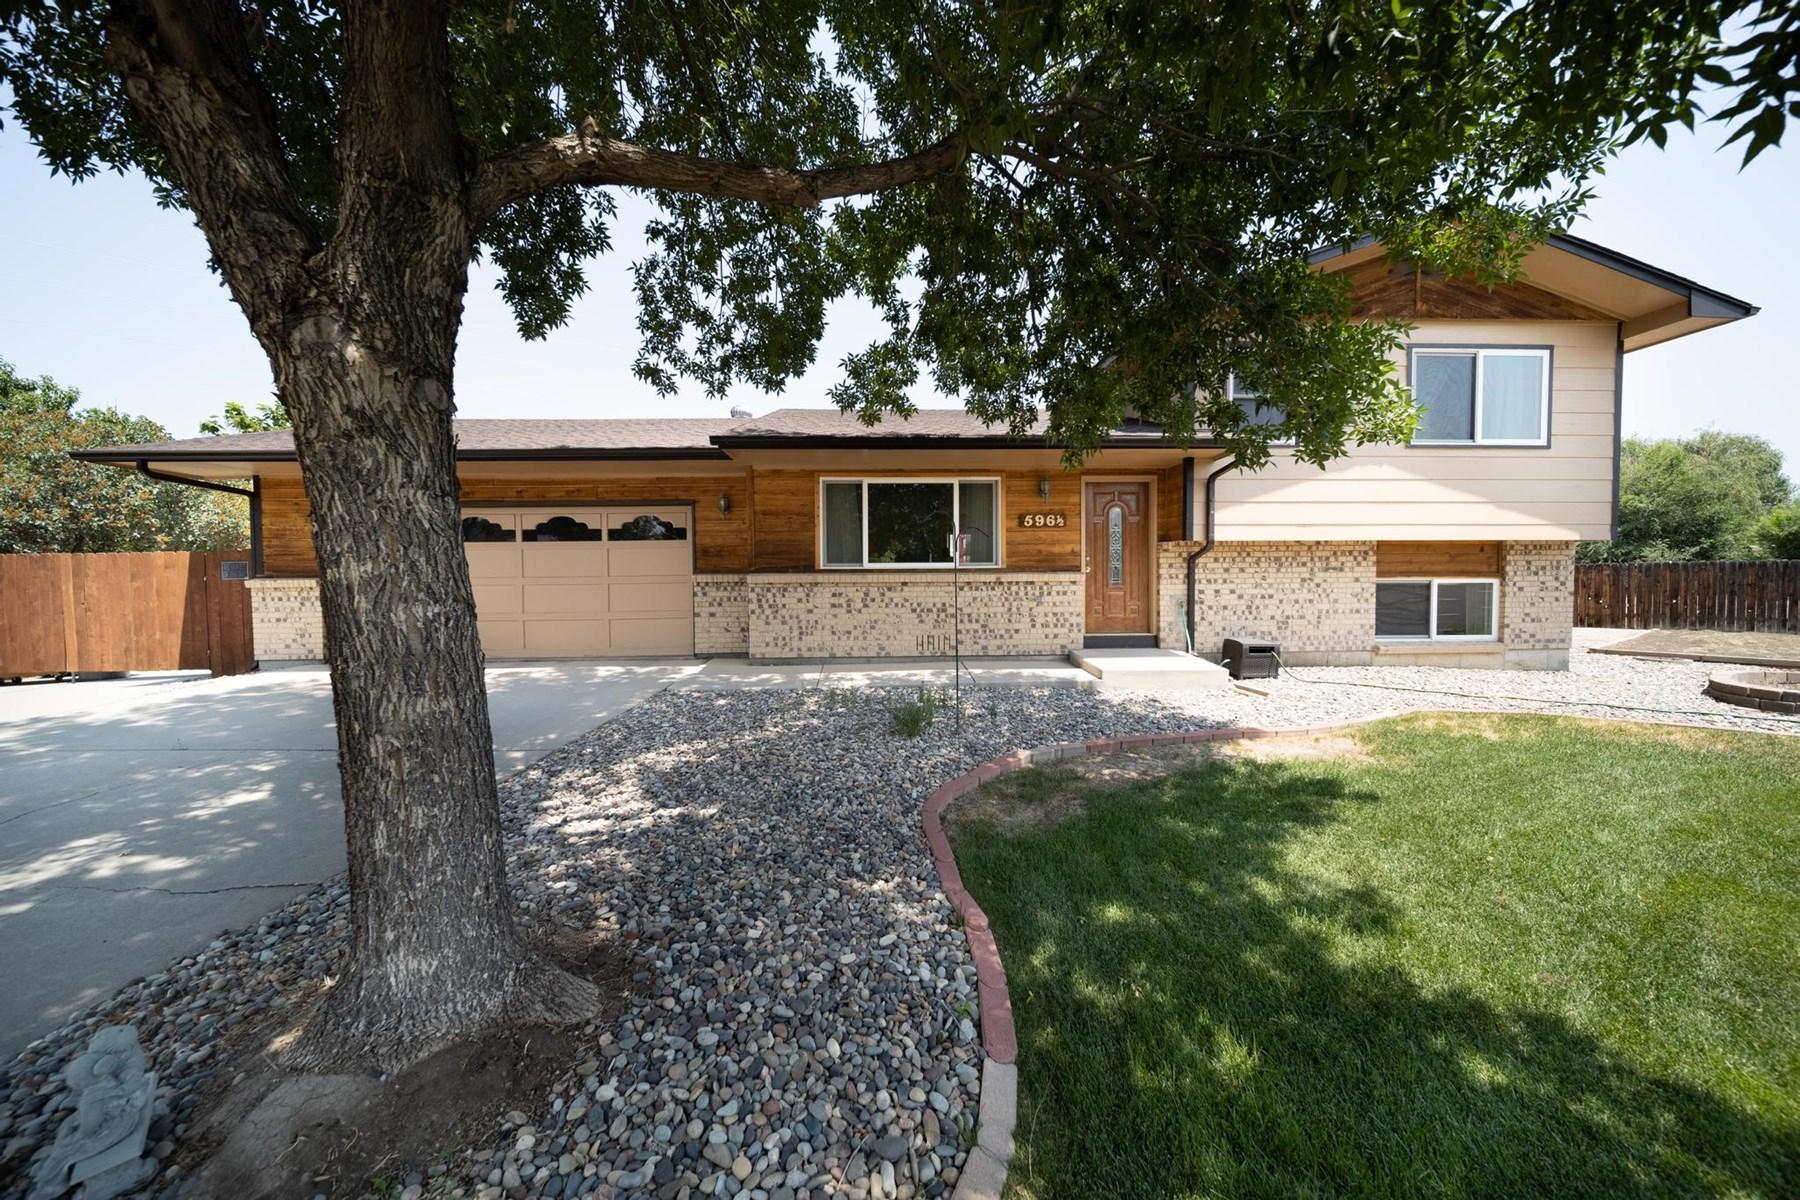 Western Colorado Home with NO HOA for Sale